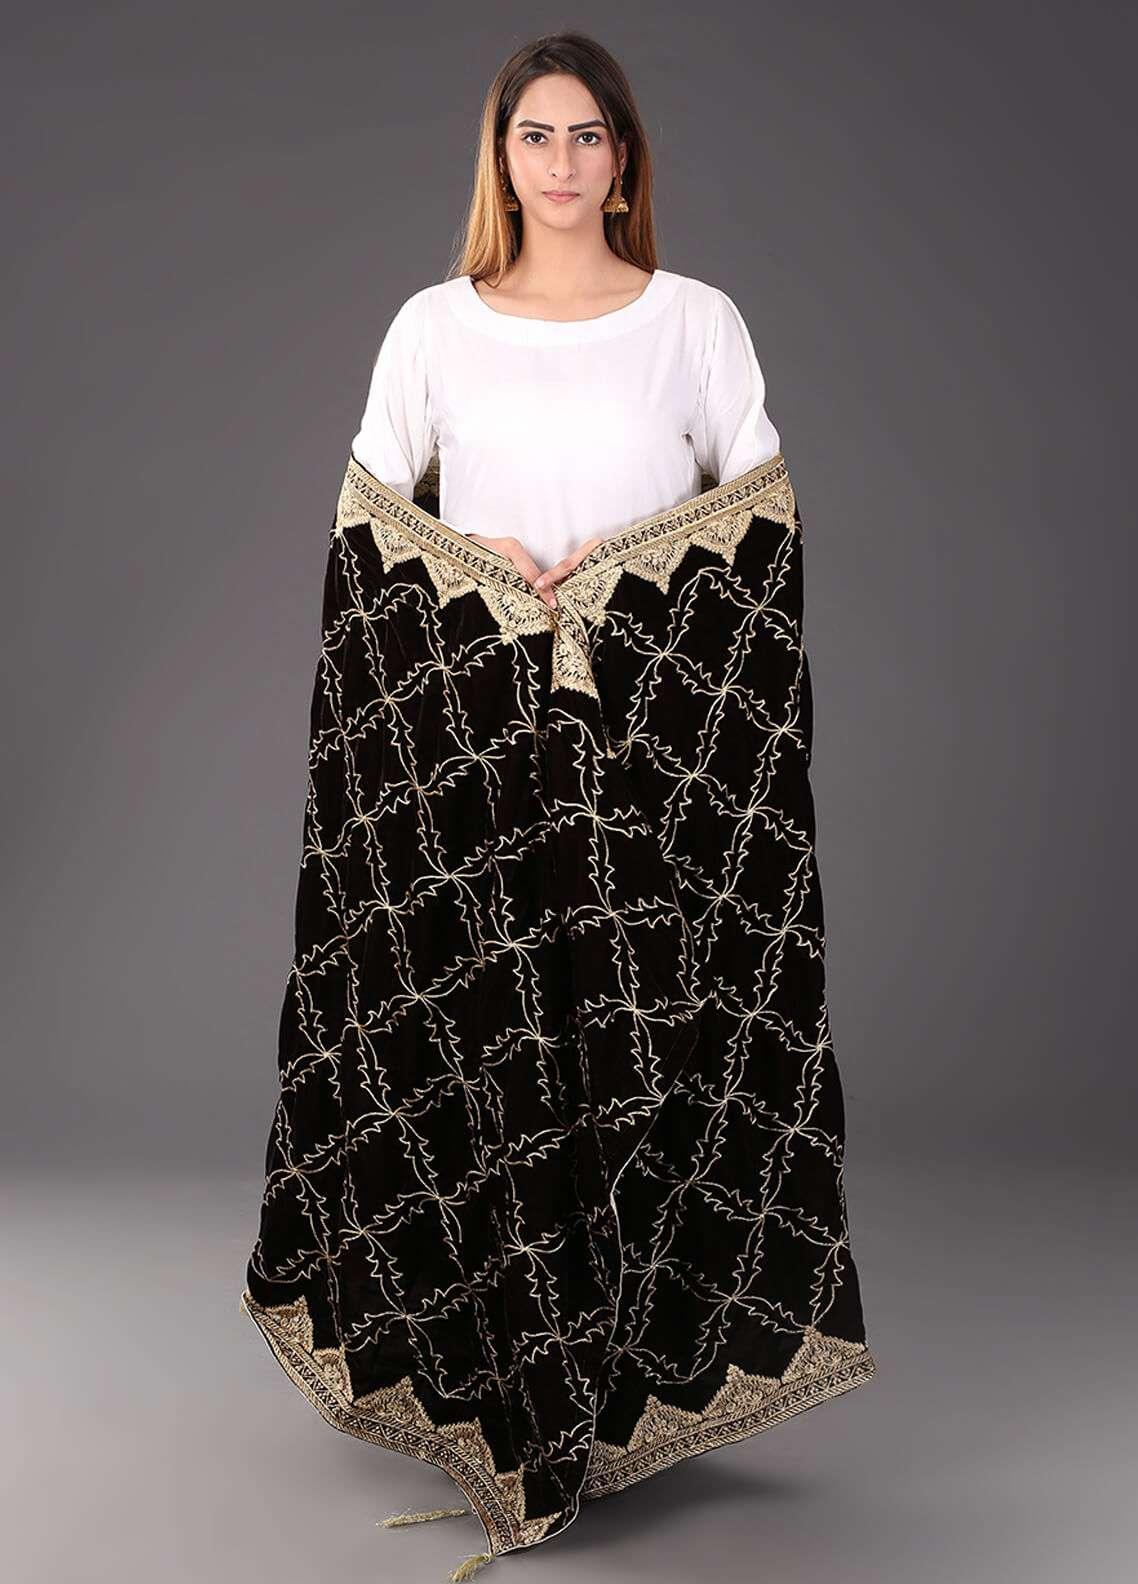 Sanaulla Exclusive Range Embroidered Velvet  Shawl 467 - Winter Collection